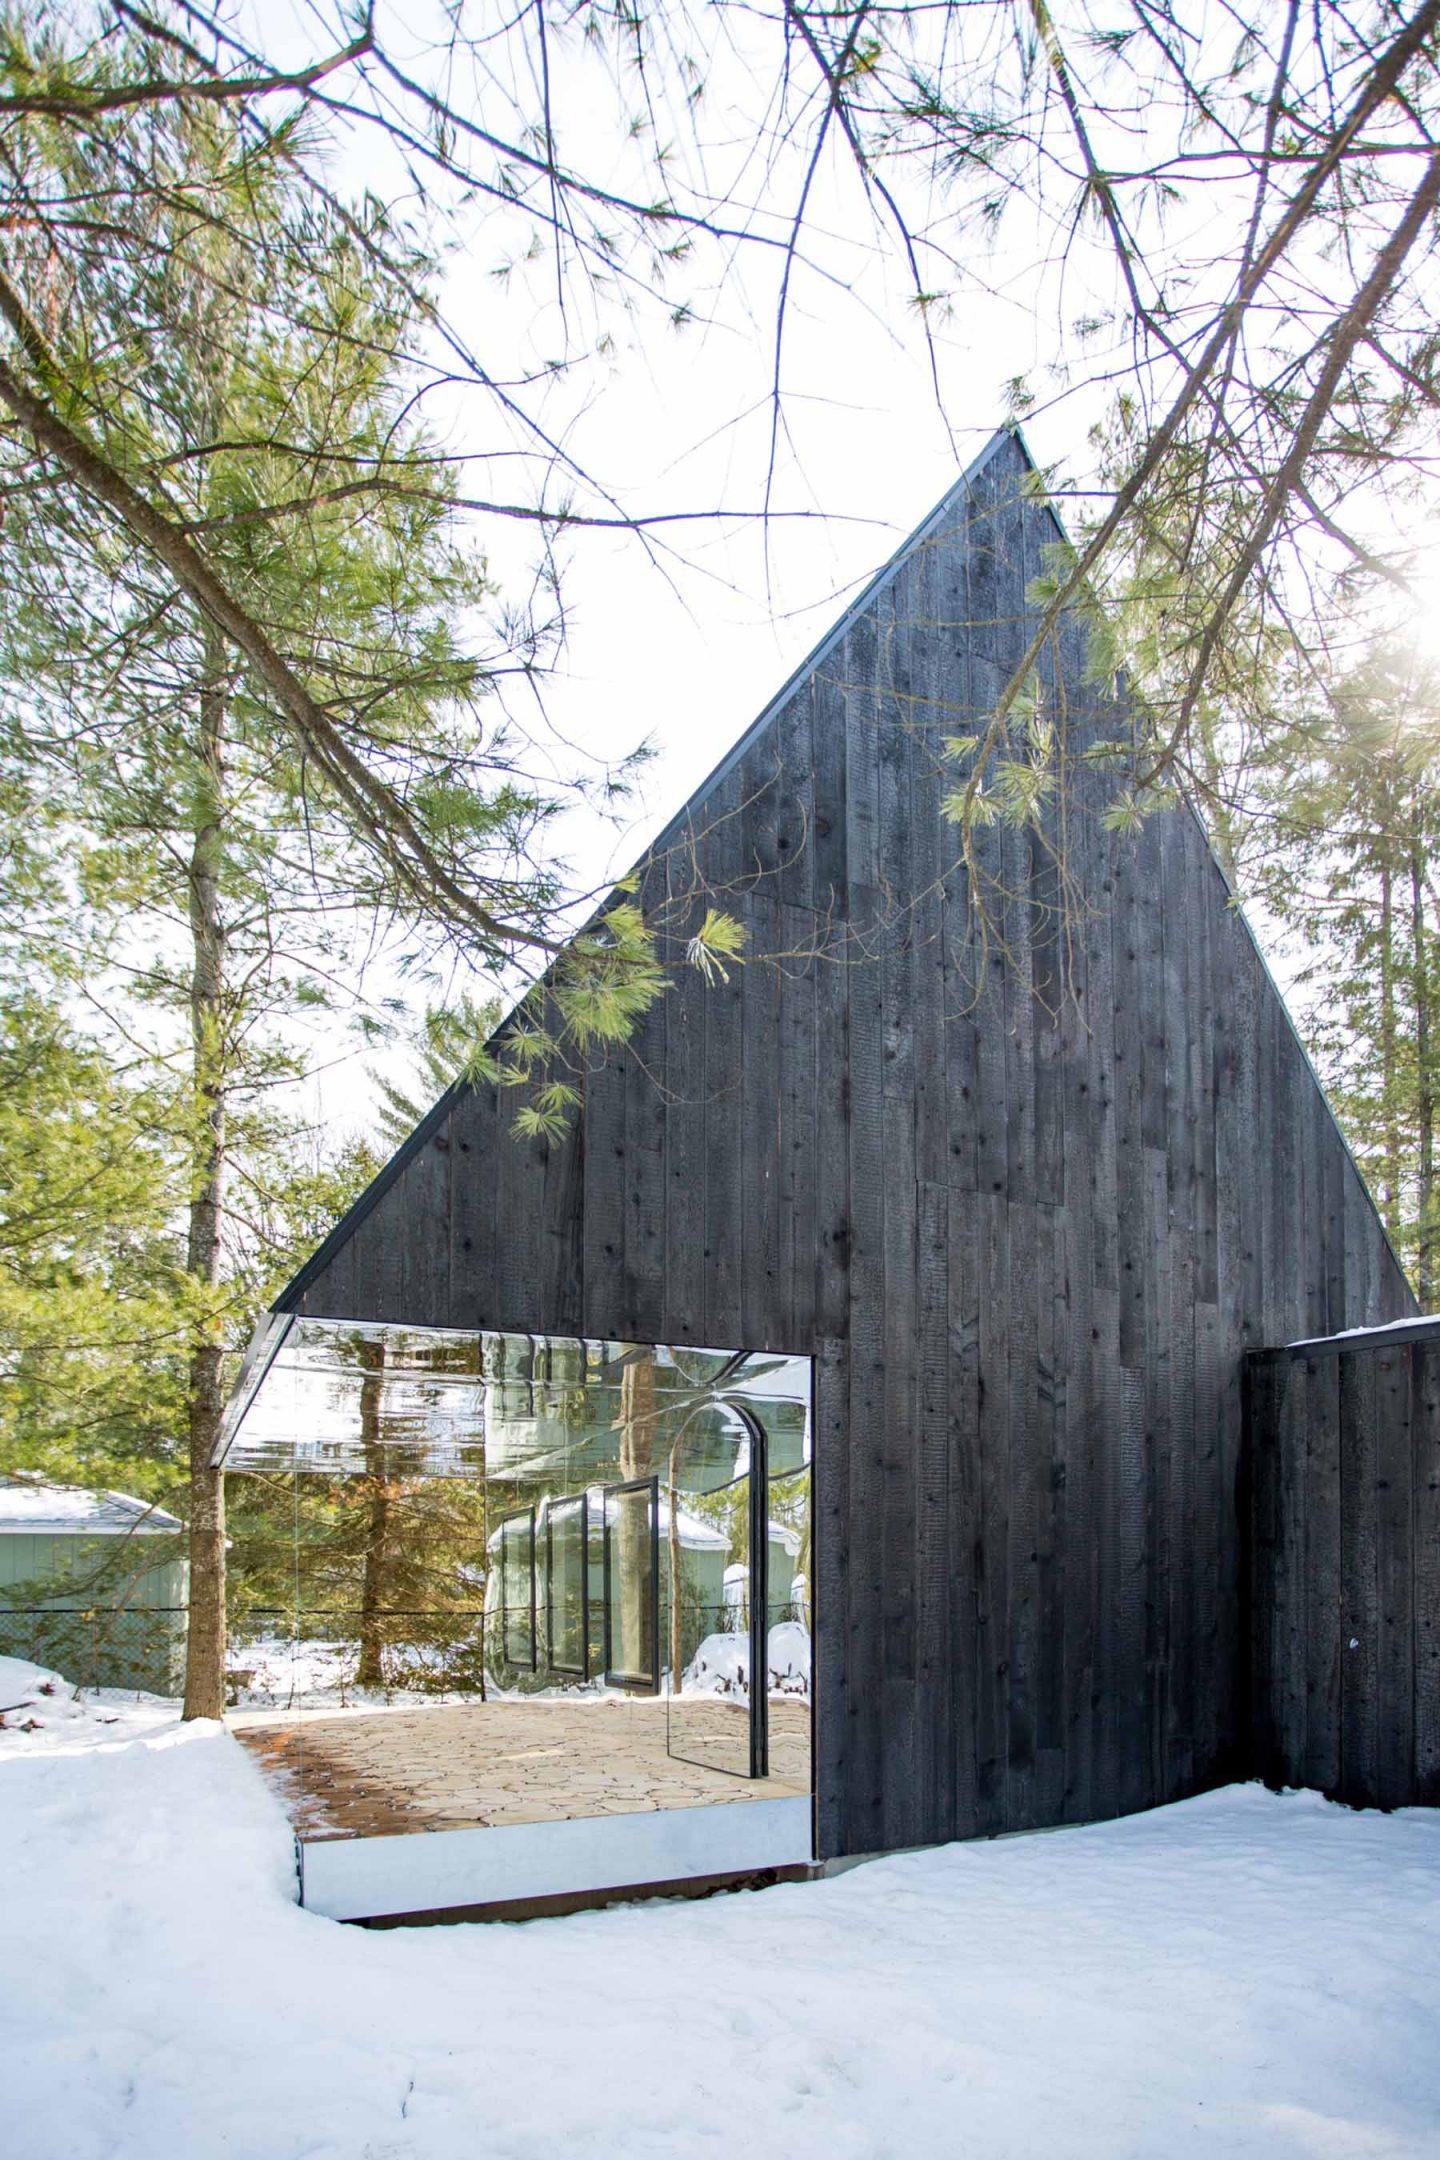 ignant-architecture-uufie-the-lake-cottage-13-1440x2160.jpg